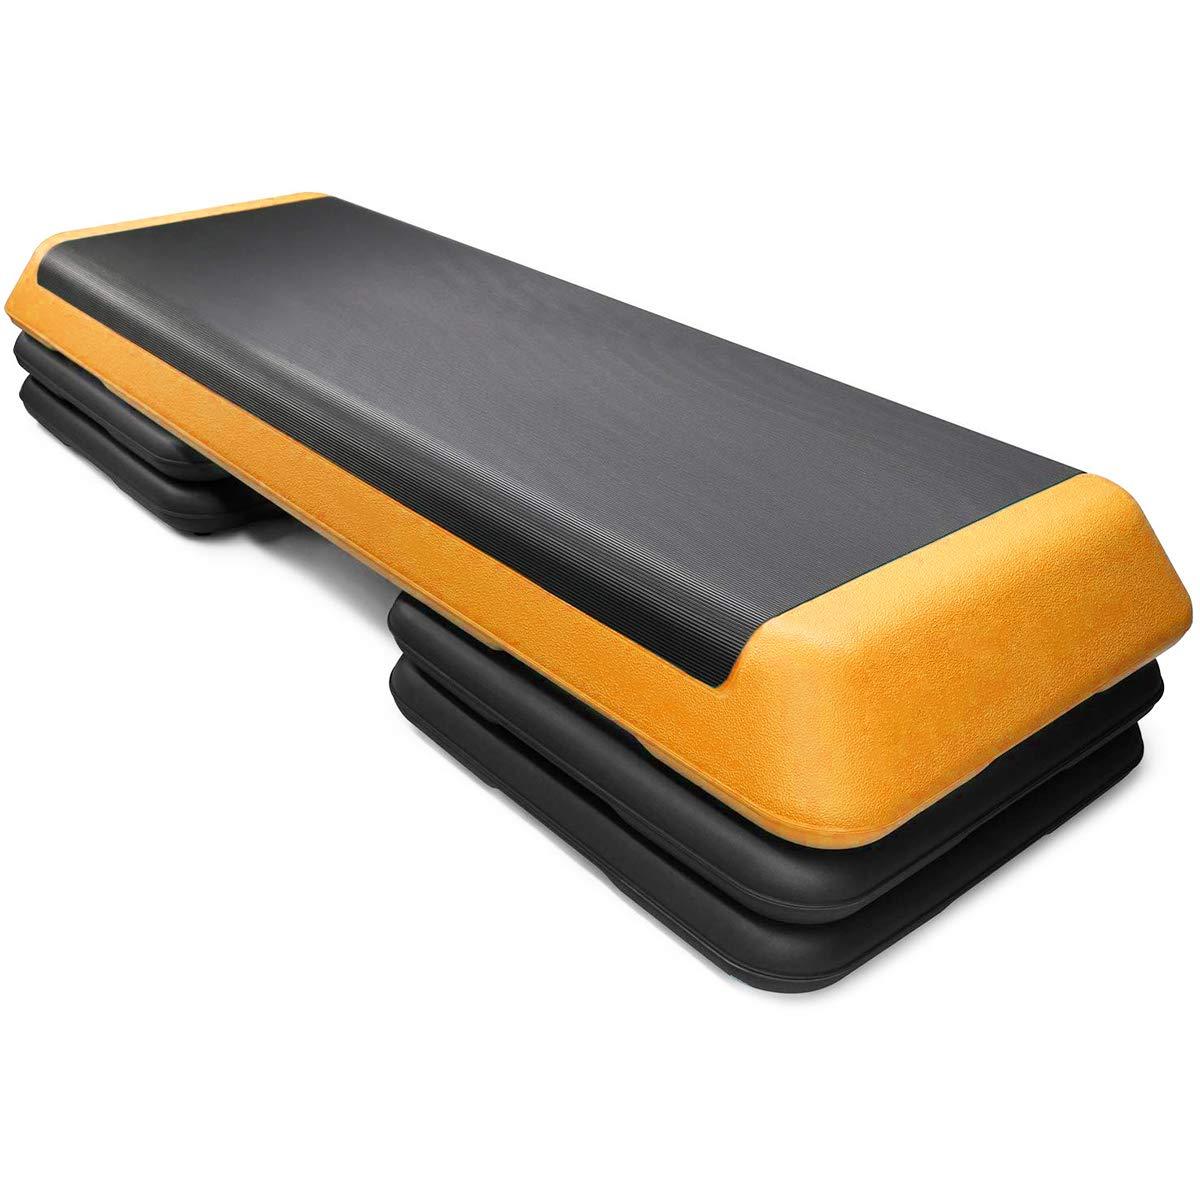 "Goplus 43'' Step Platform Adjustable Fitness Aerobic Stepper 4"""